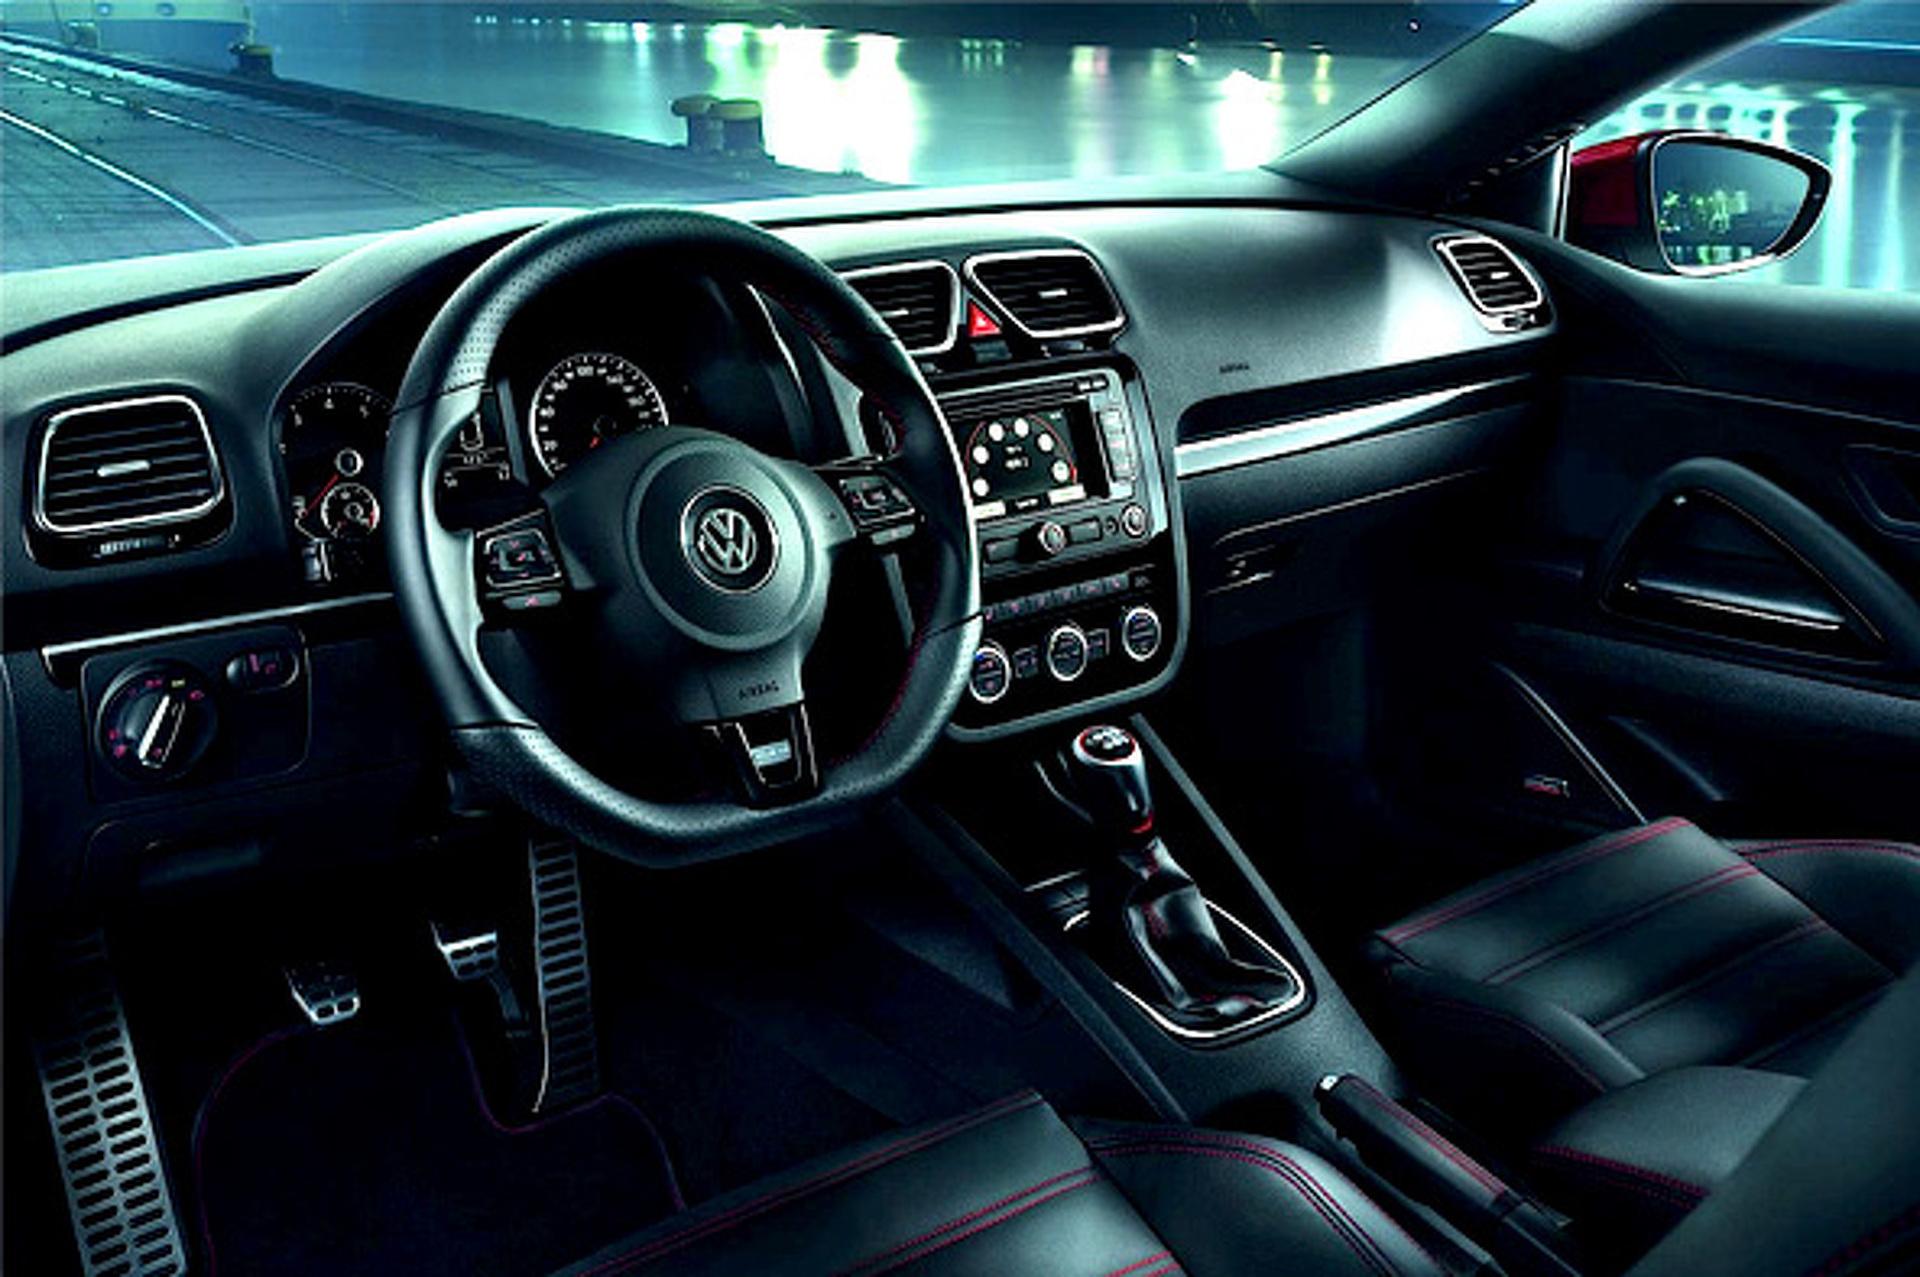 Unveiled: 30th Anniversary Volkswagen Scirocco GTS